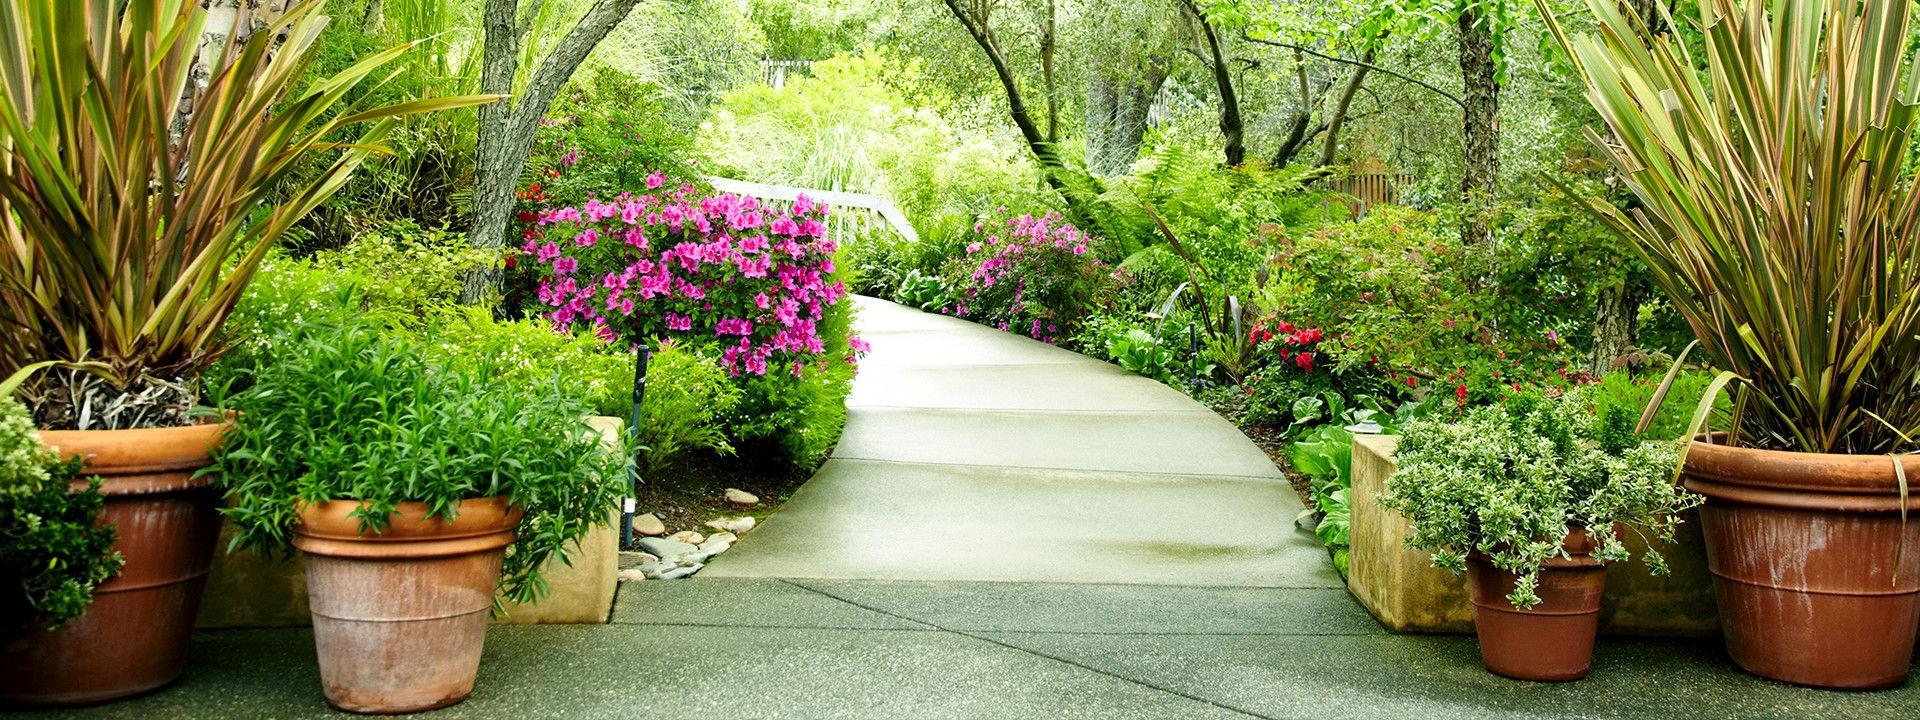 Resources | Skyview Memorial Lawn